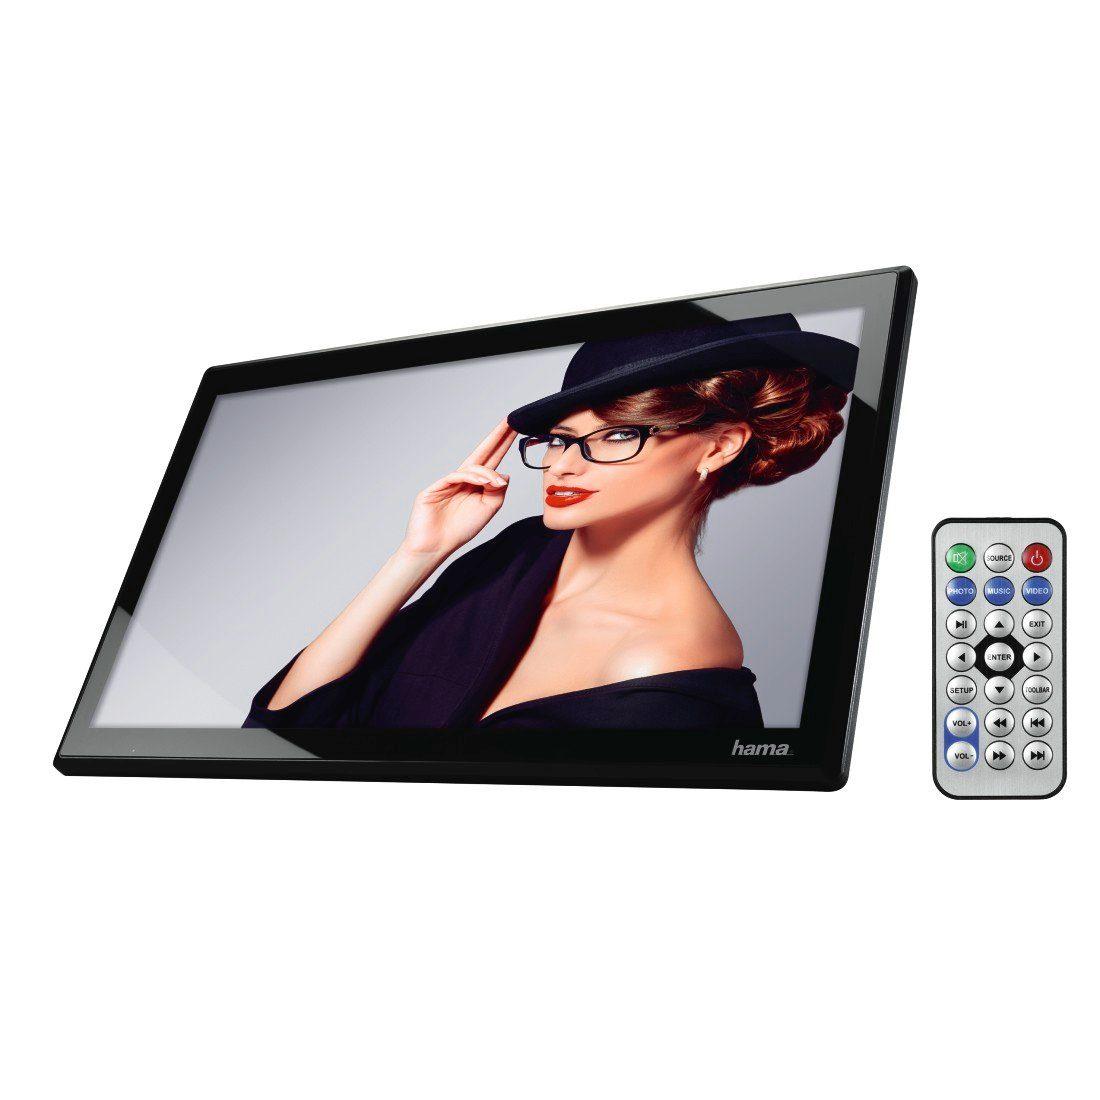 Hama Digitaler Bilderrahmen Full HD, 43,94 cm (17,3 Zoll) »8 GB int. Speicher USB HDMI MP«